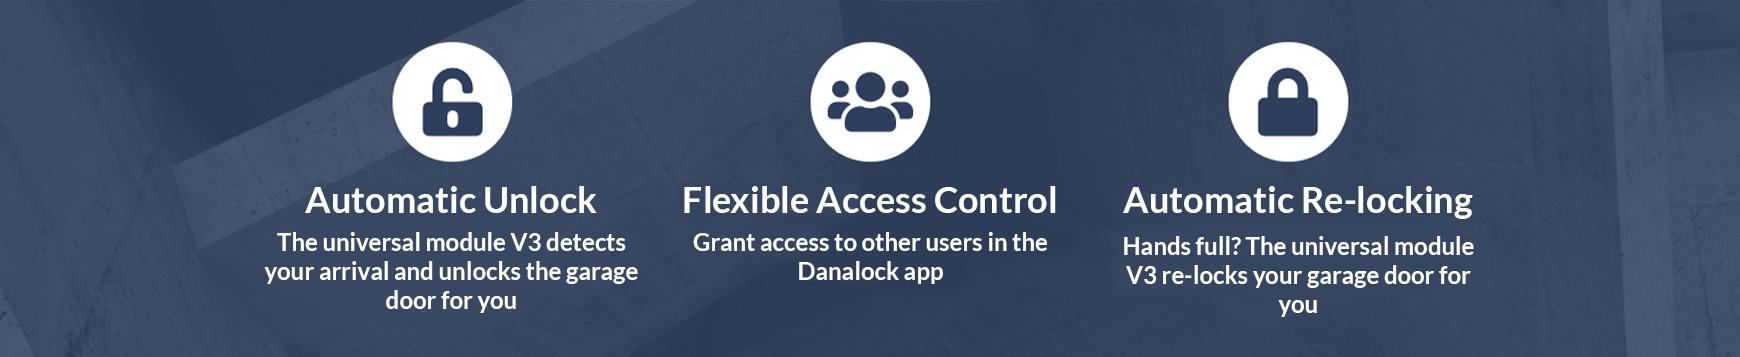 danalock-universalmodule-features-banner